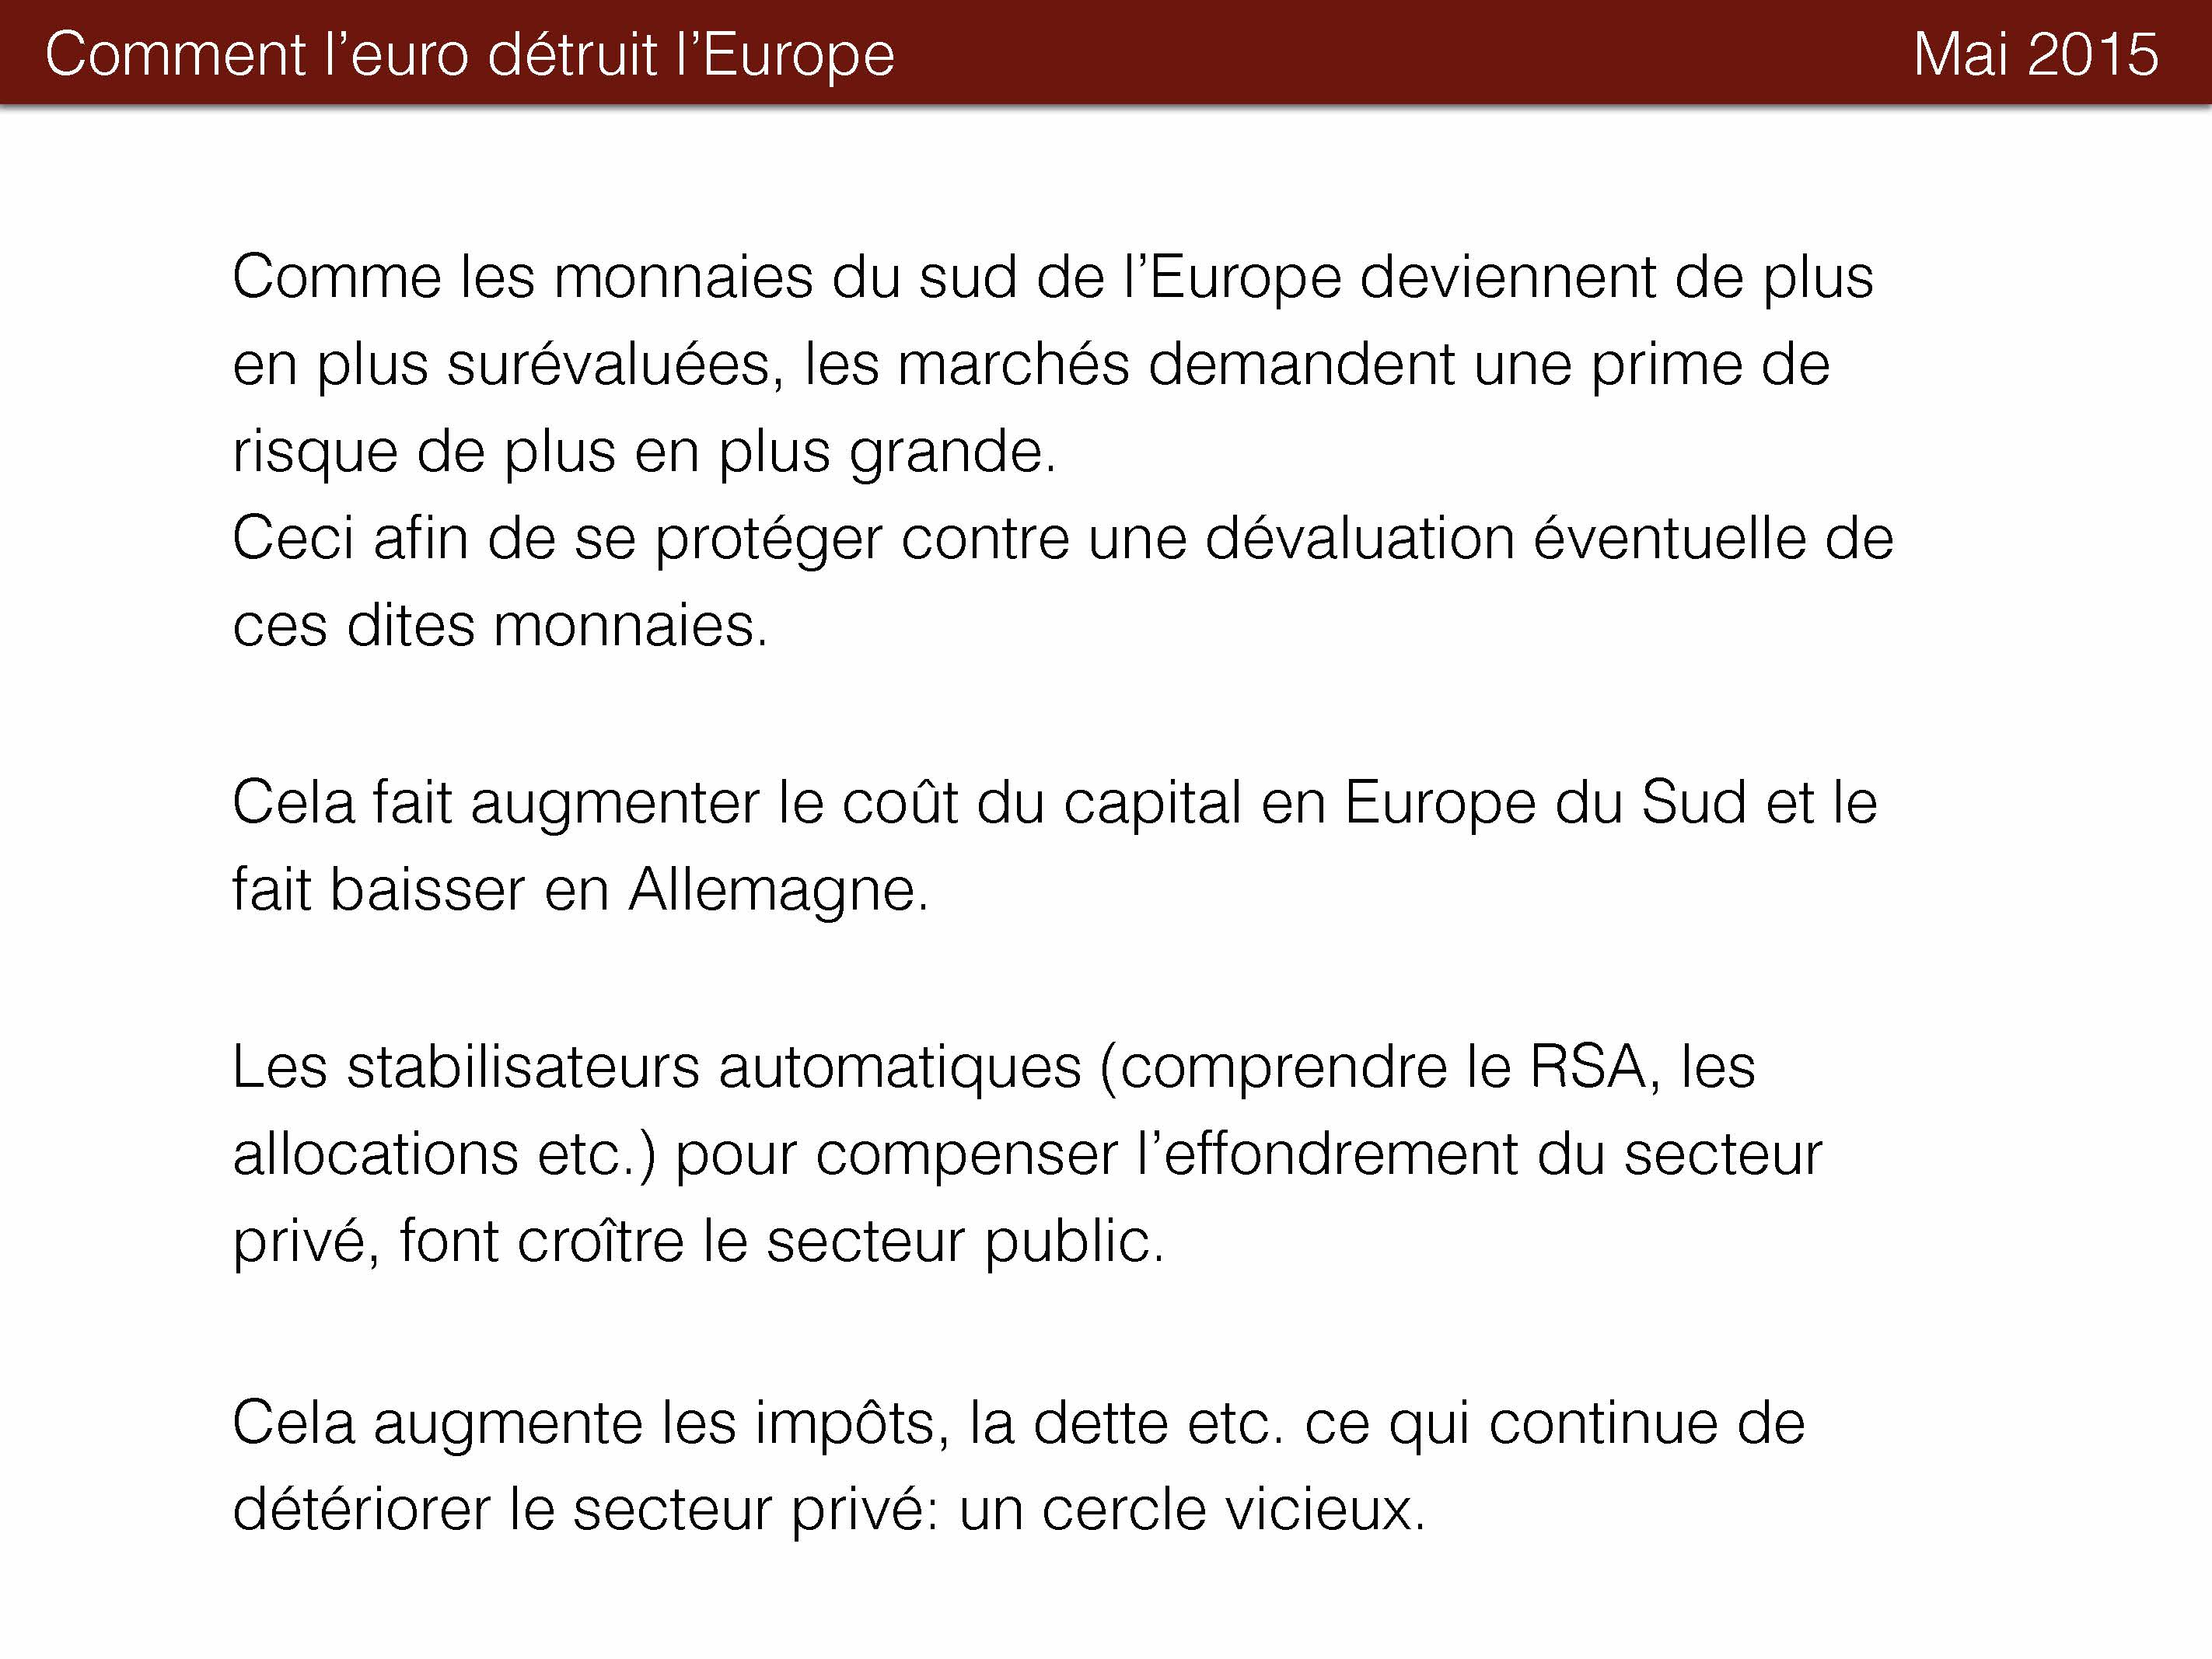 EUro_Page_13